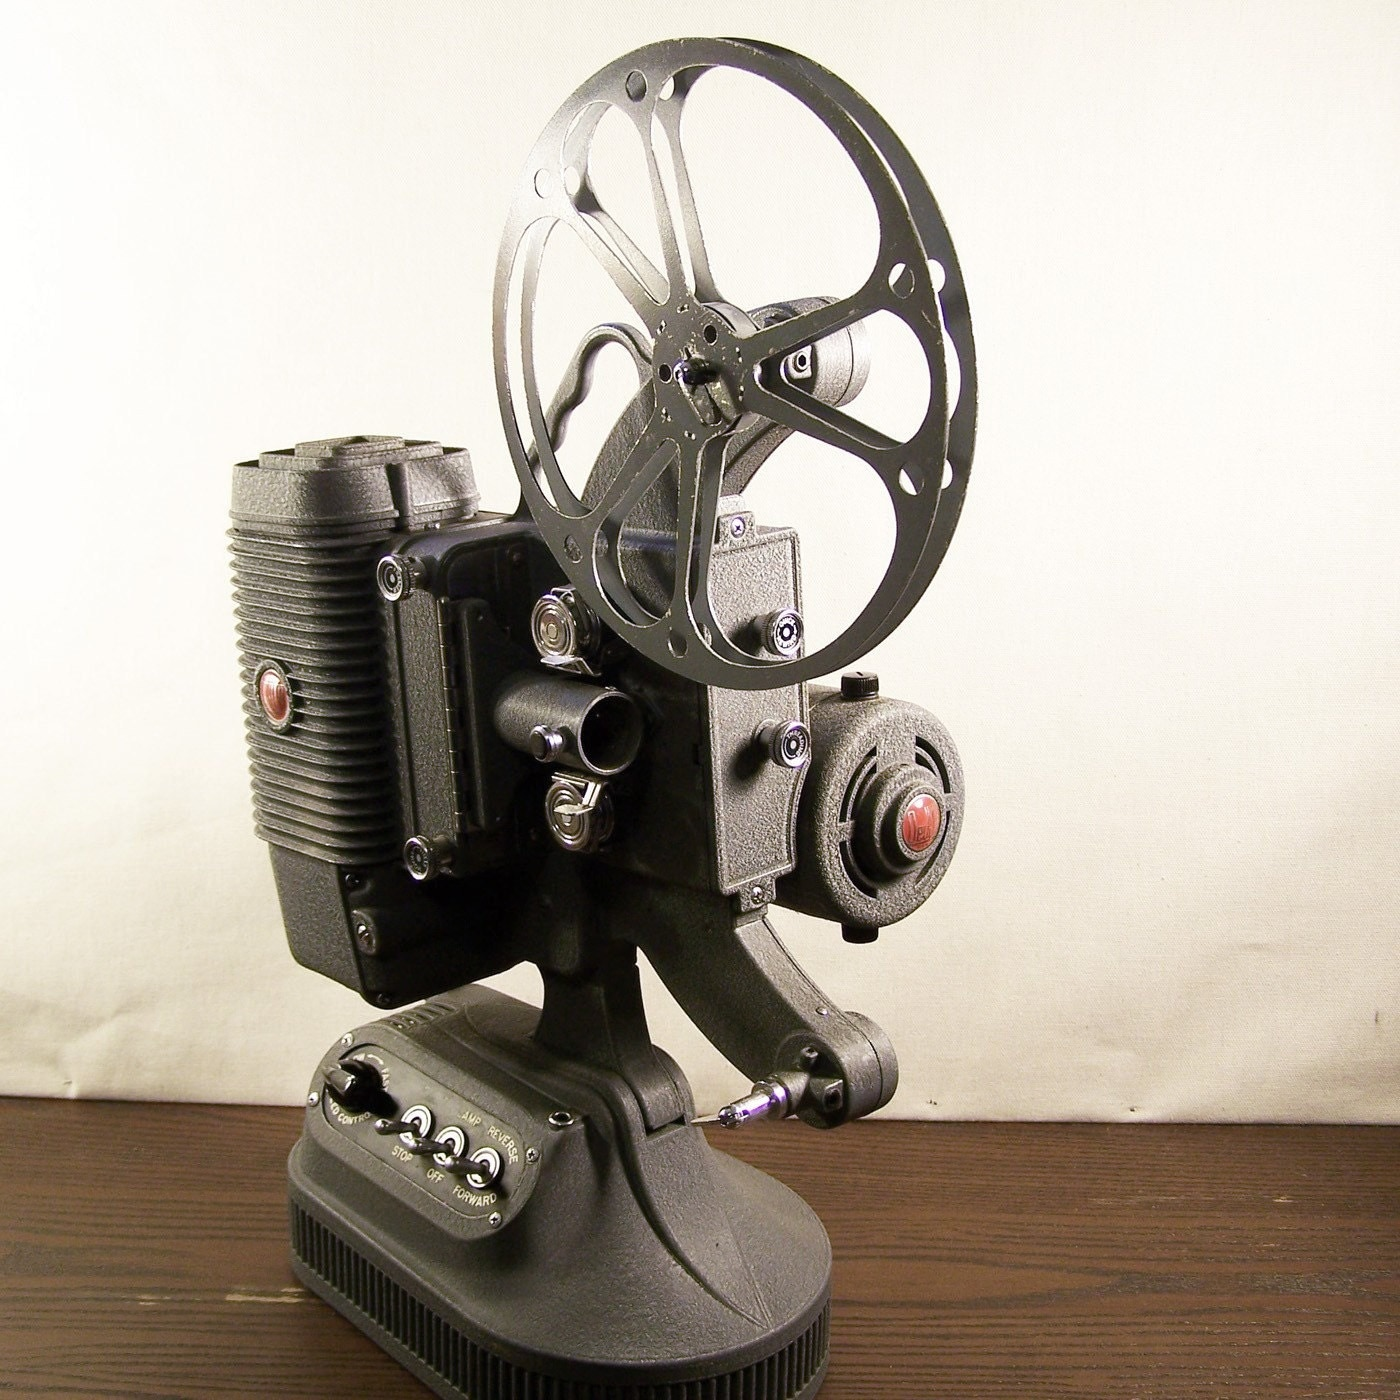 Vintage 1950s Dejur 8mm Movie Projector